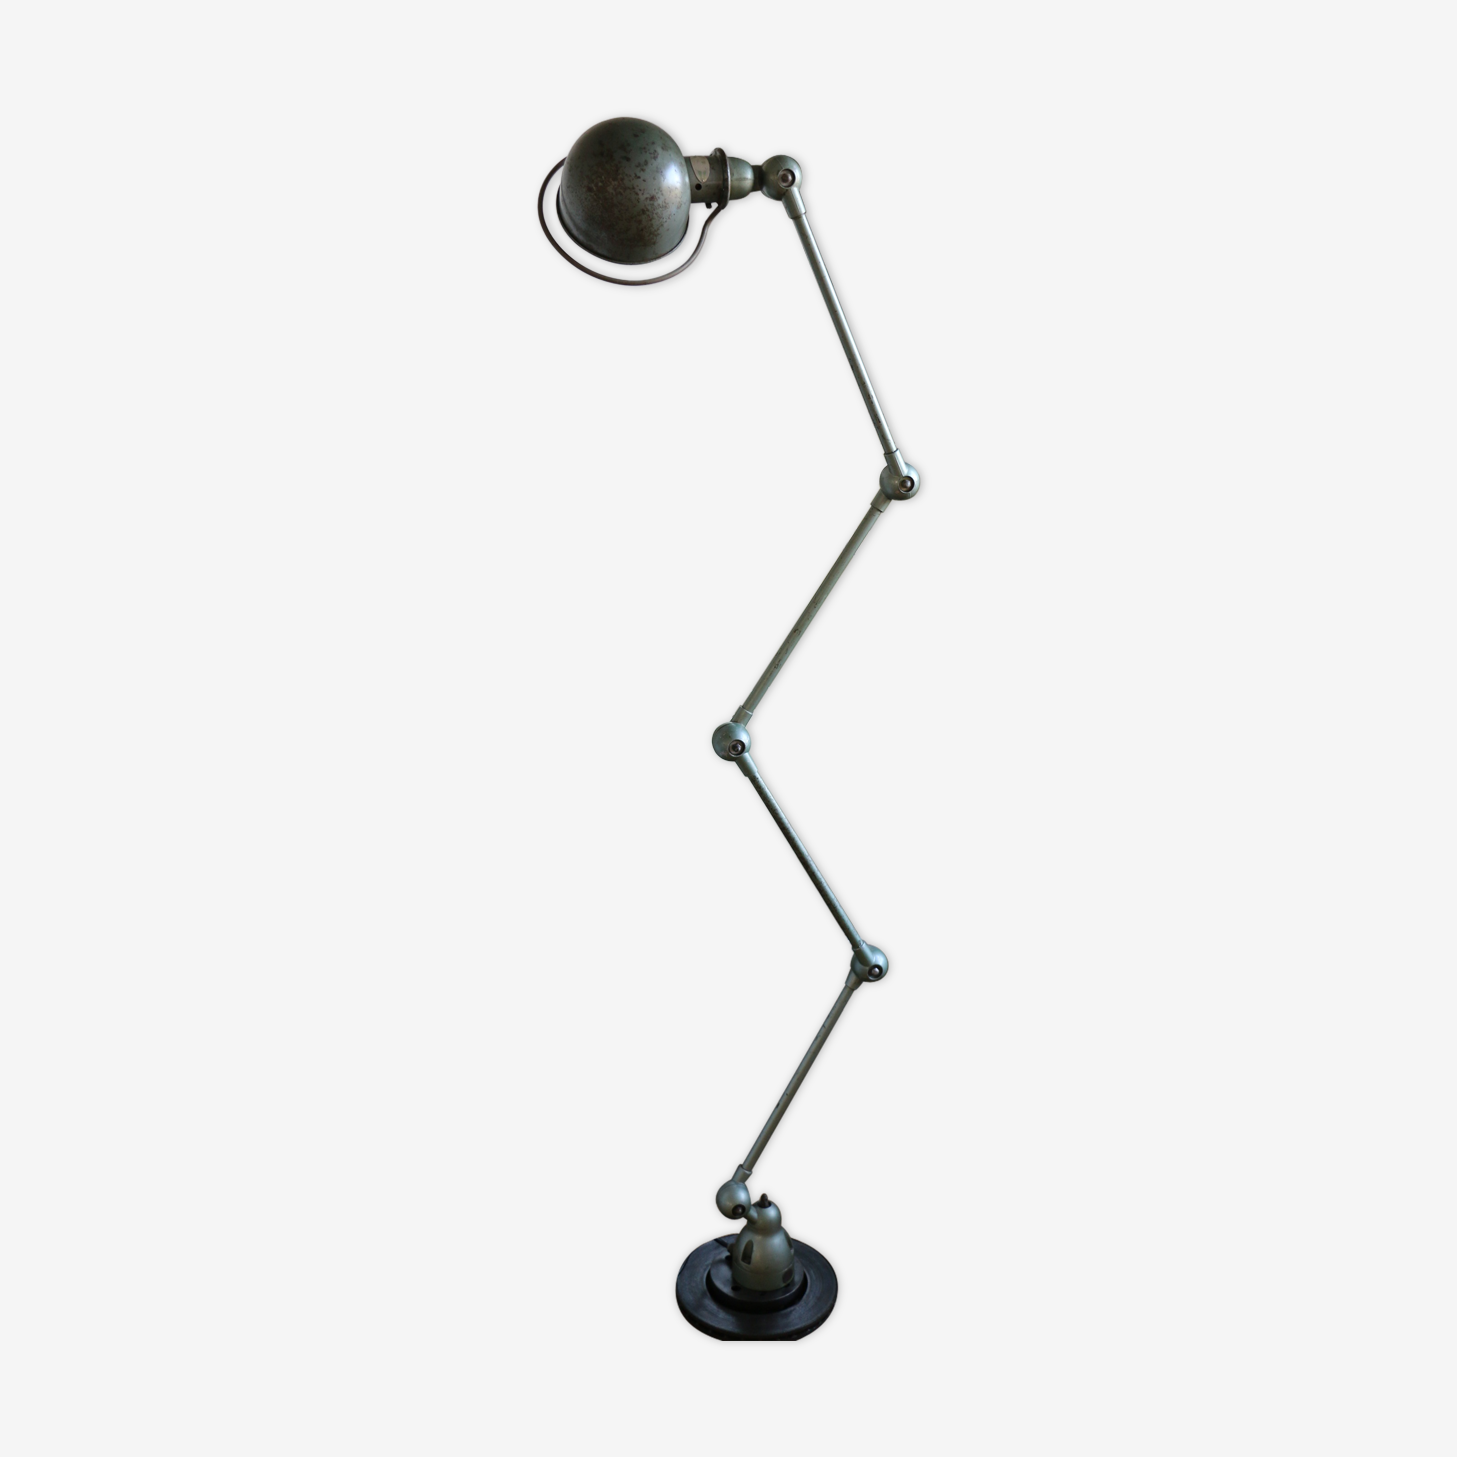 Lampe Jielde A 4 Bras Verte Des Annees 50 Metal Vert Design